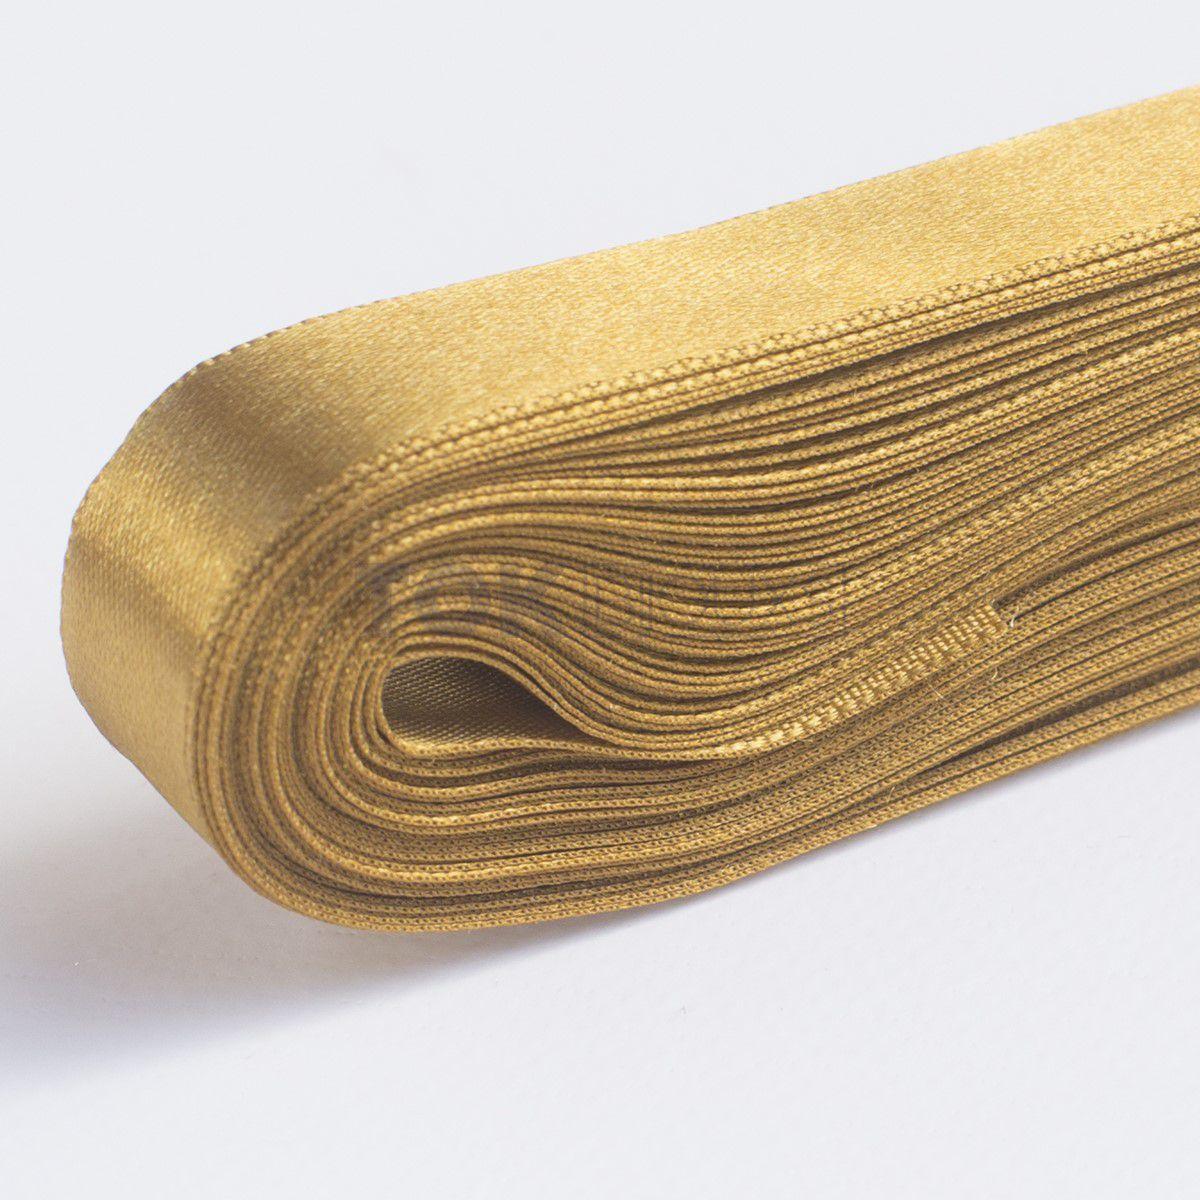 Fita Cetim N.3 - 15mm - 10 Metros - COR (47) Dourado